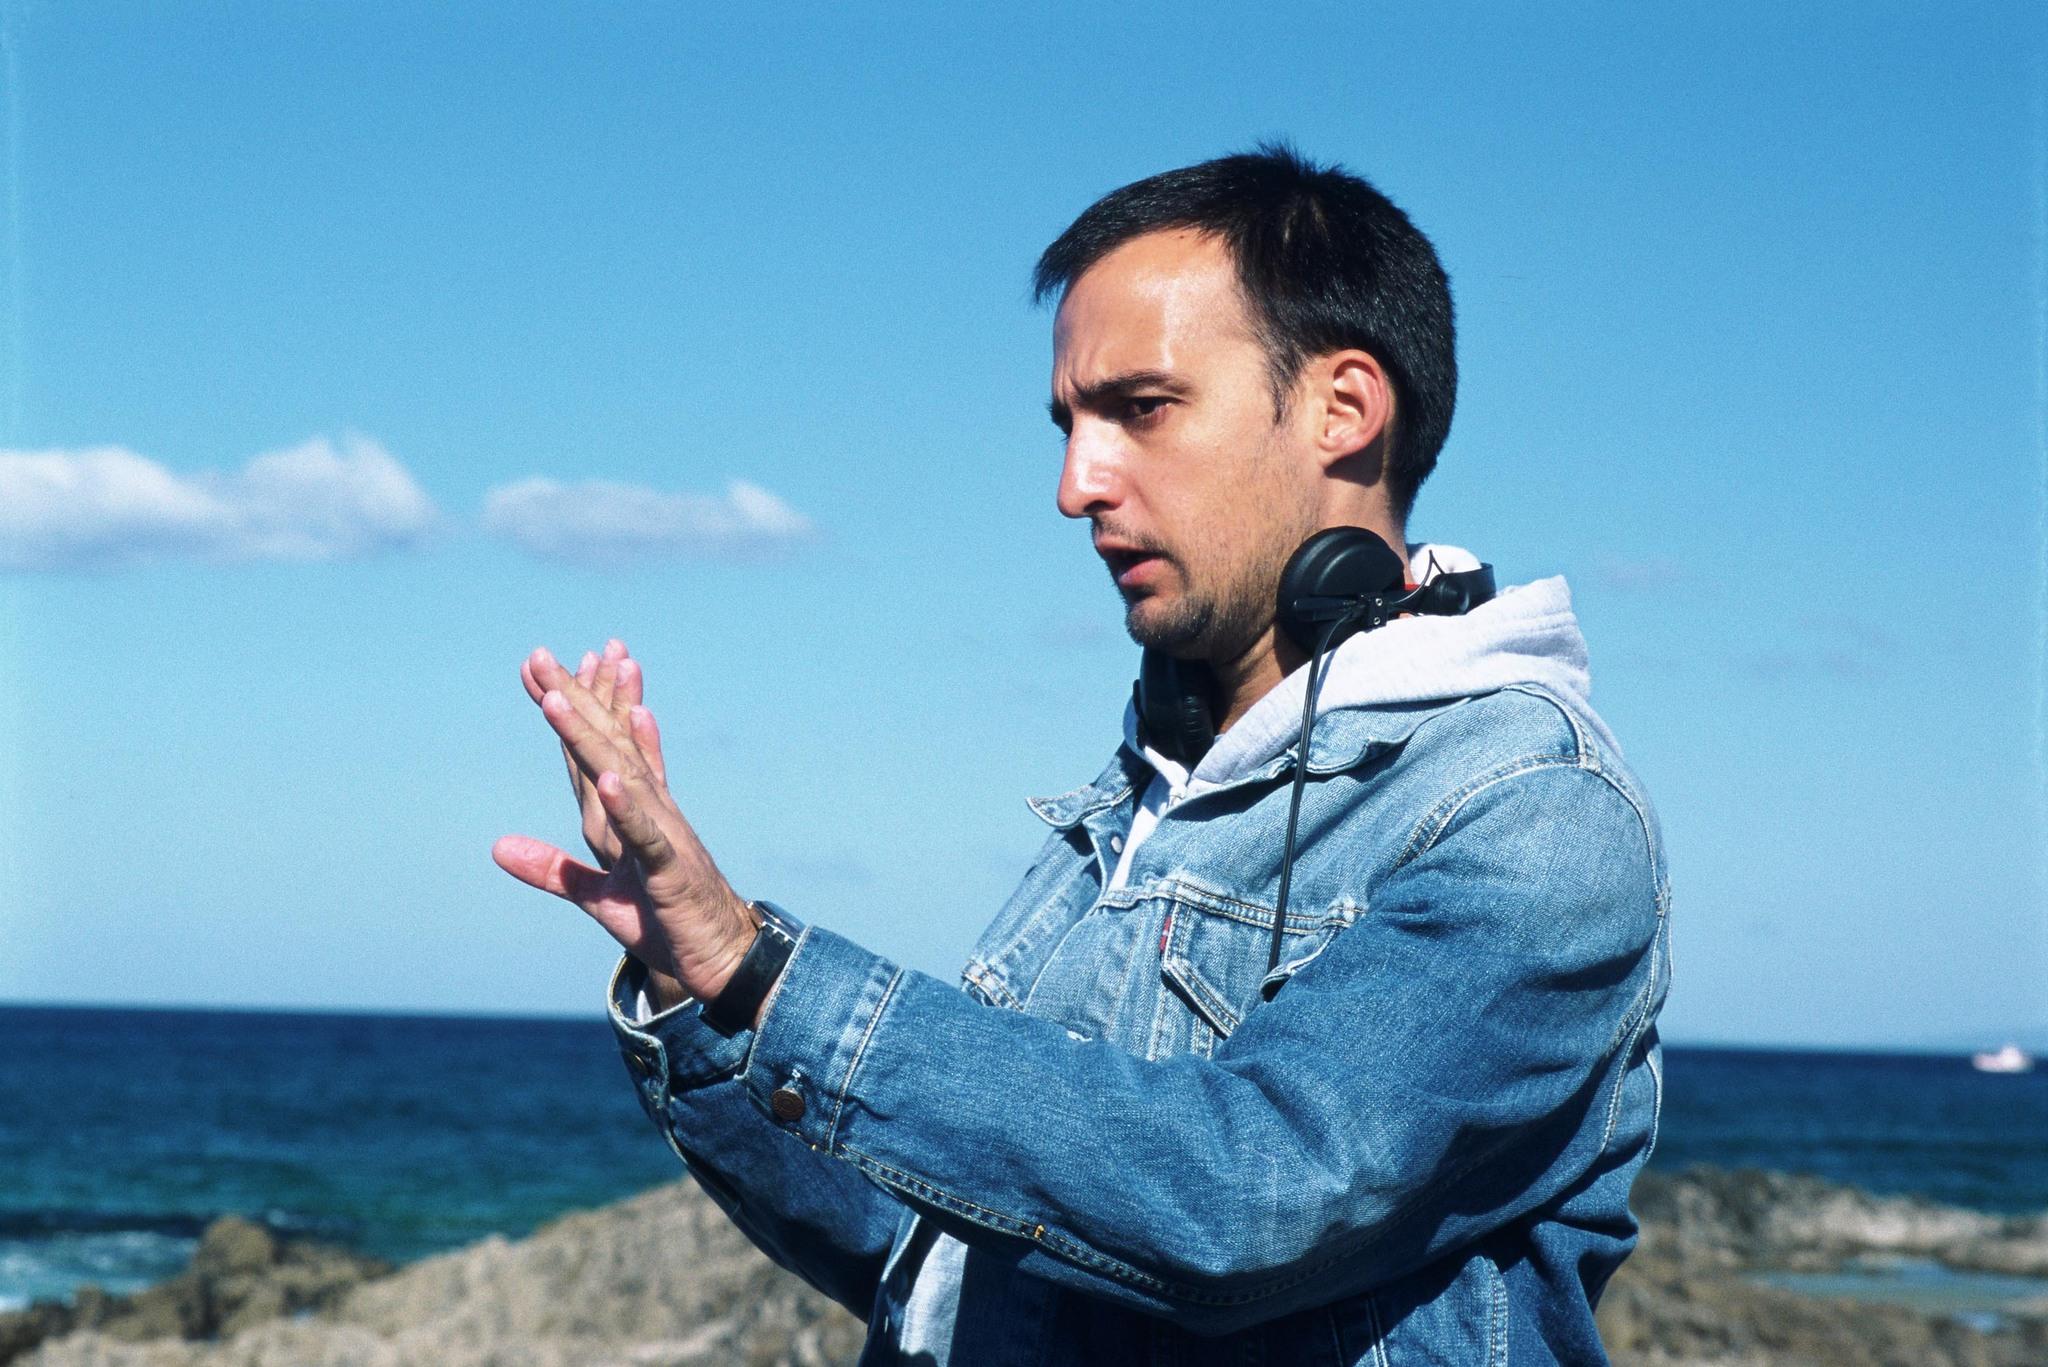 Alejandro Amenábar in Mar adentro (2004)